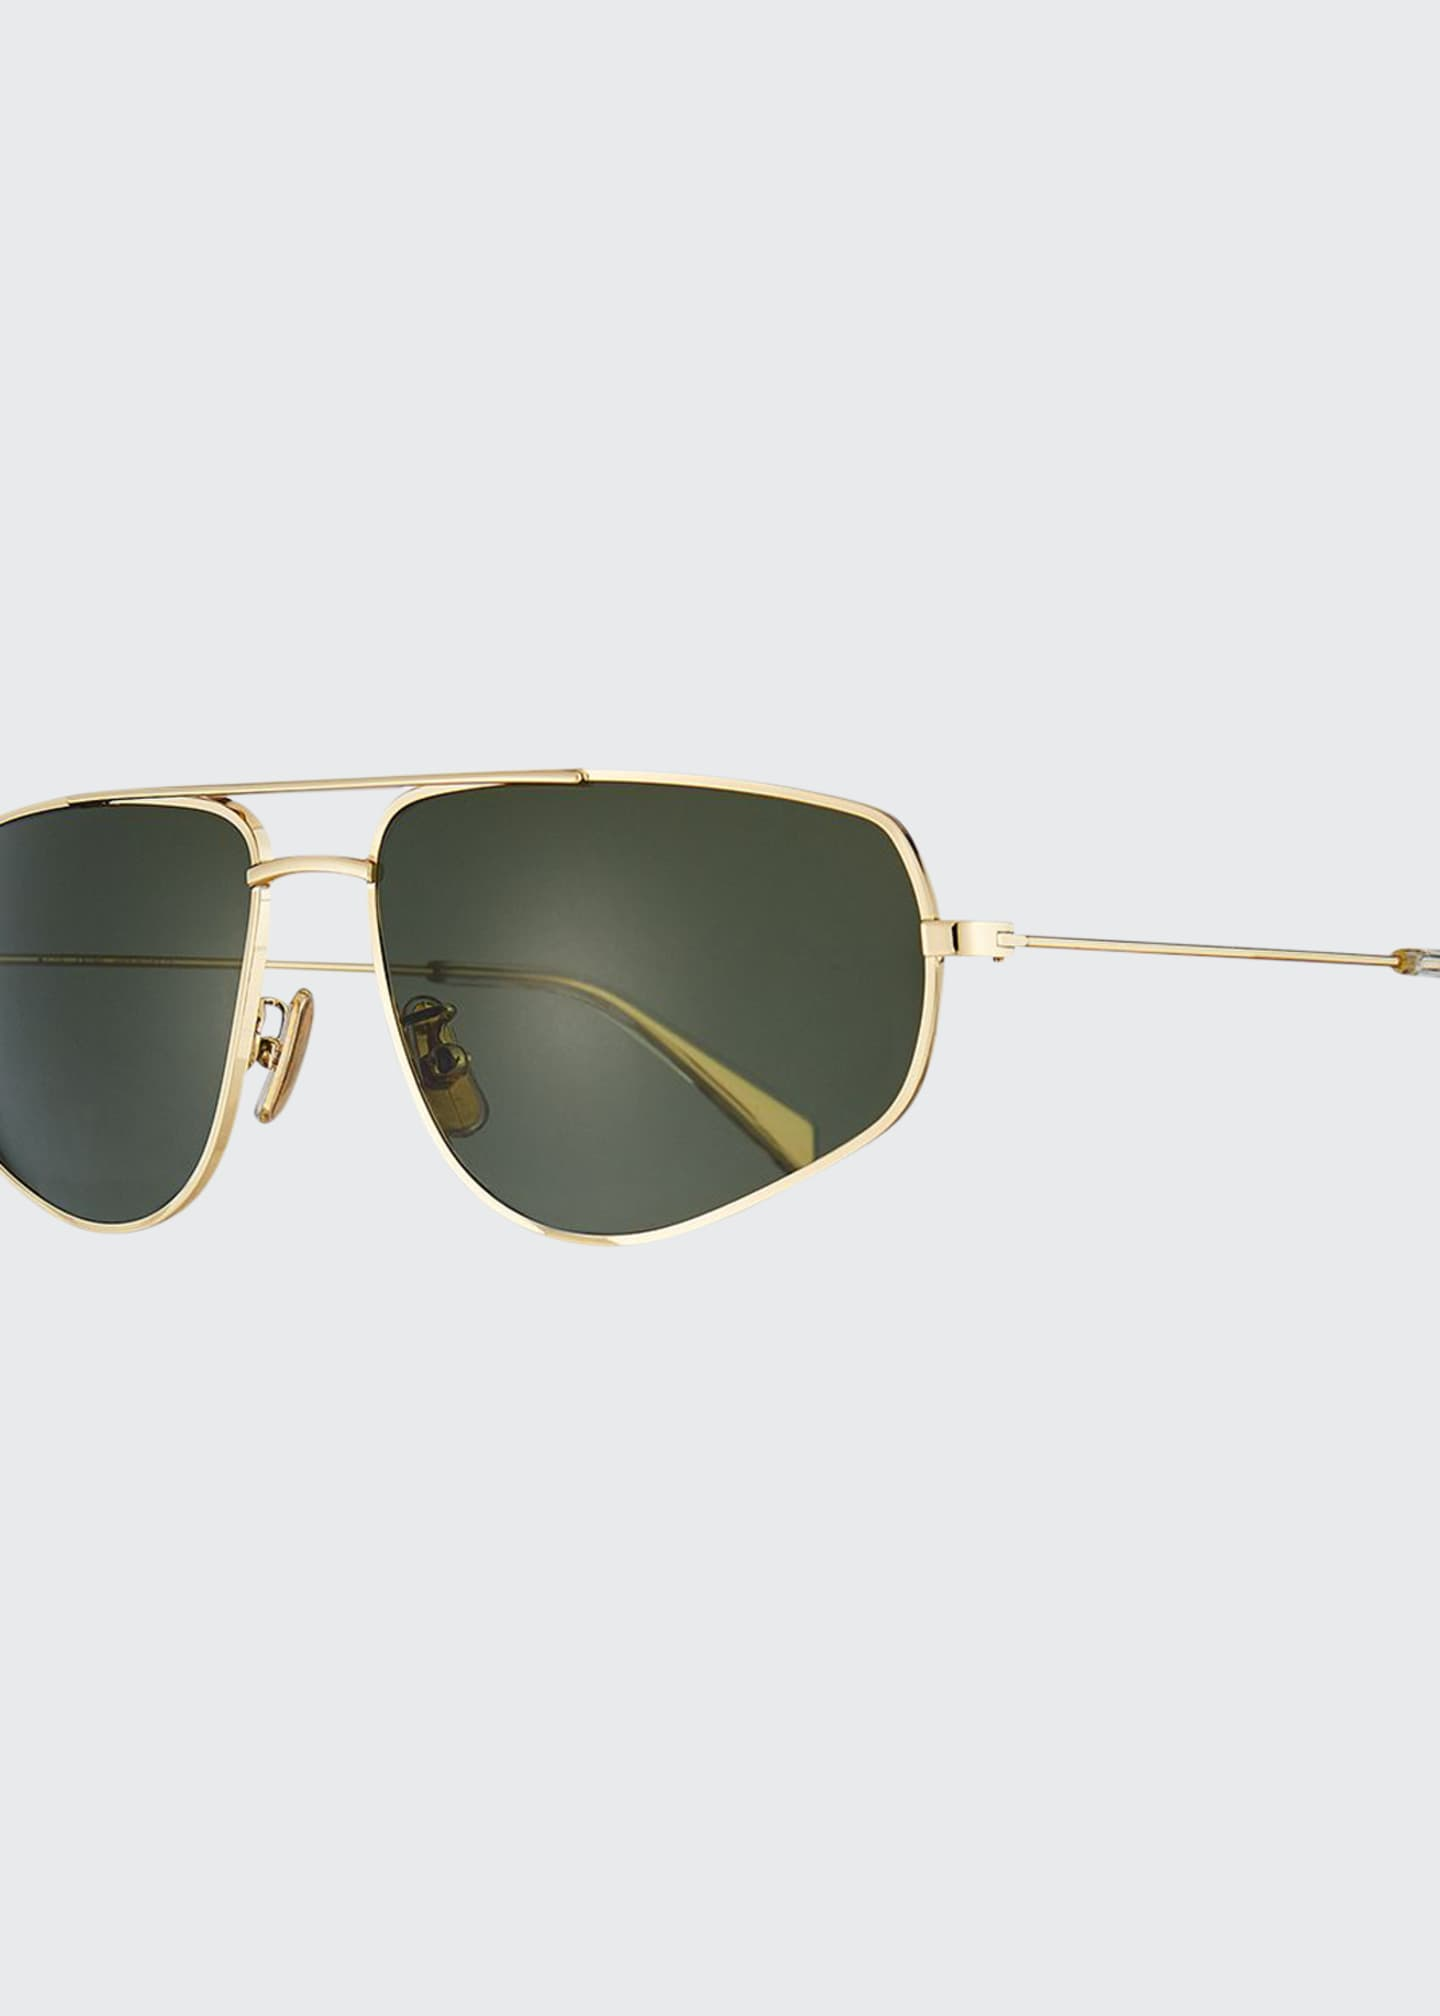 Celine Men's Golden Geometric Rectangle Sunglasses